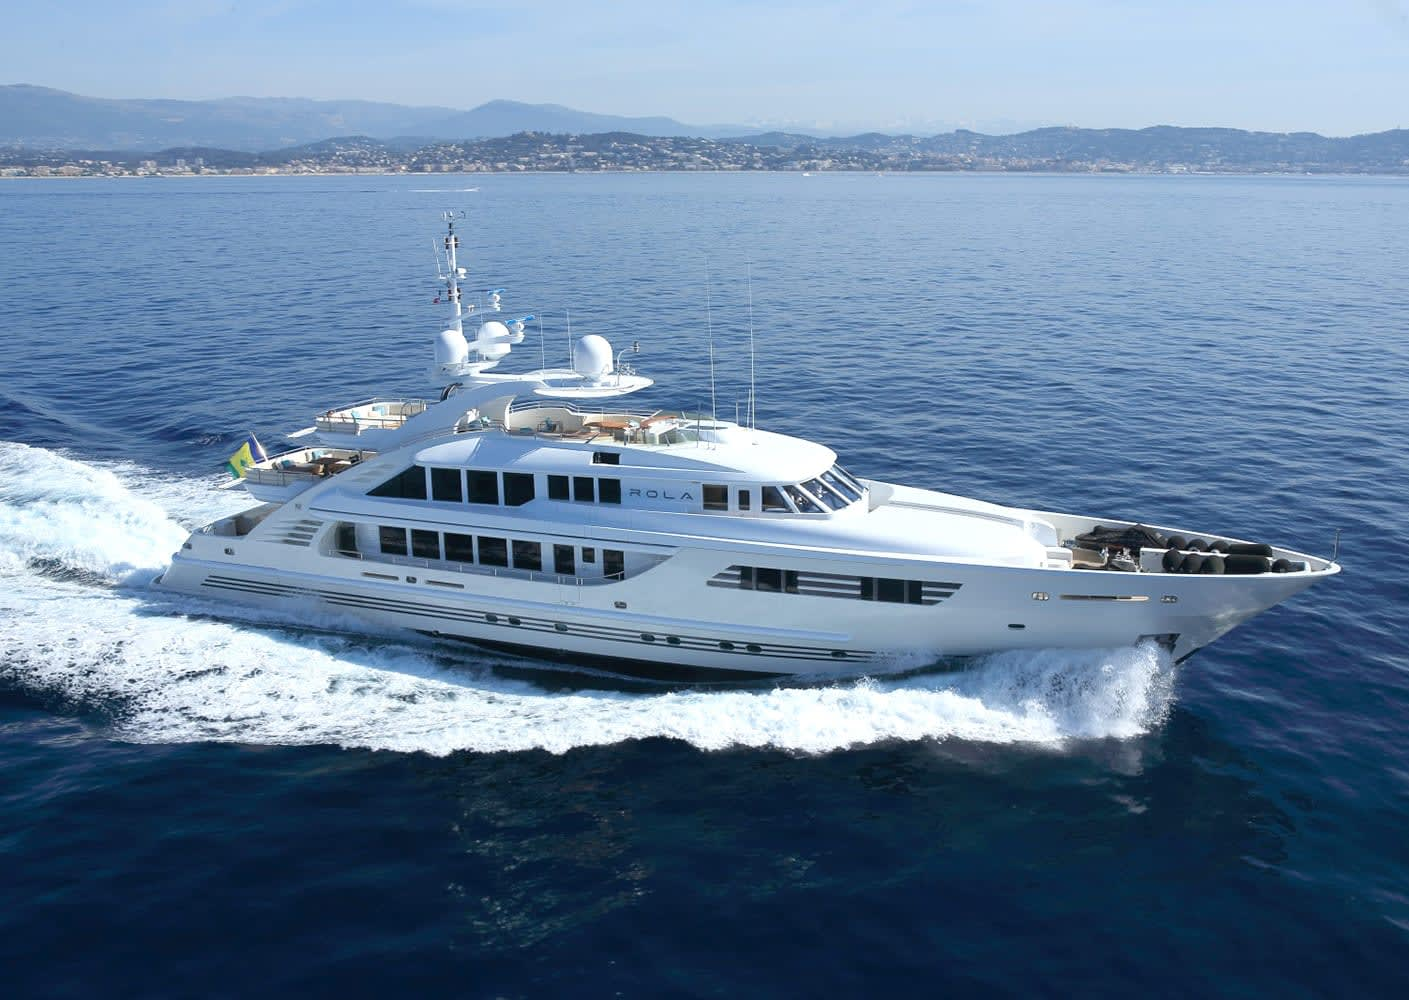 Image of Rola 47.5M (155.8FT) motor yacht